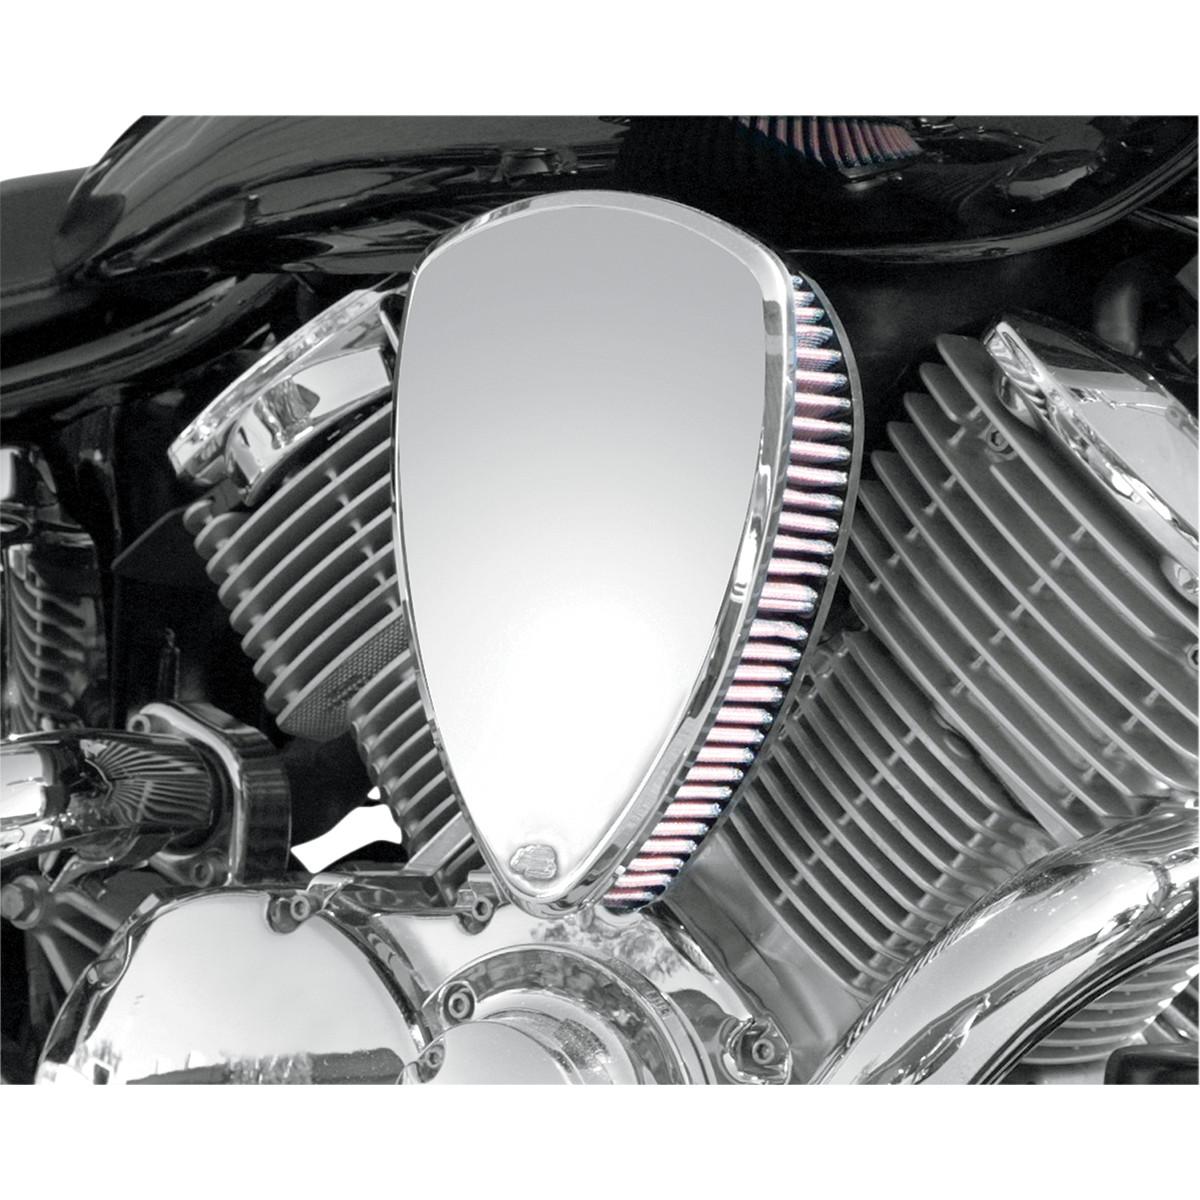 Baron Custom Accessories Big Air Flame Kit BA-2020-03